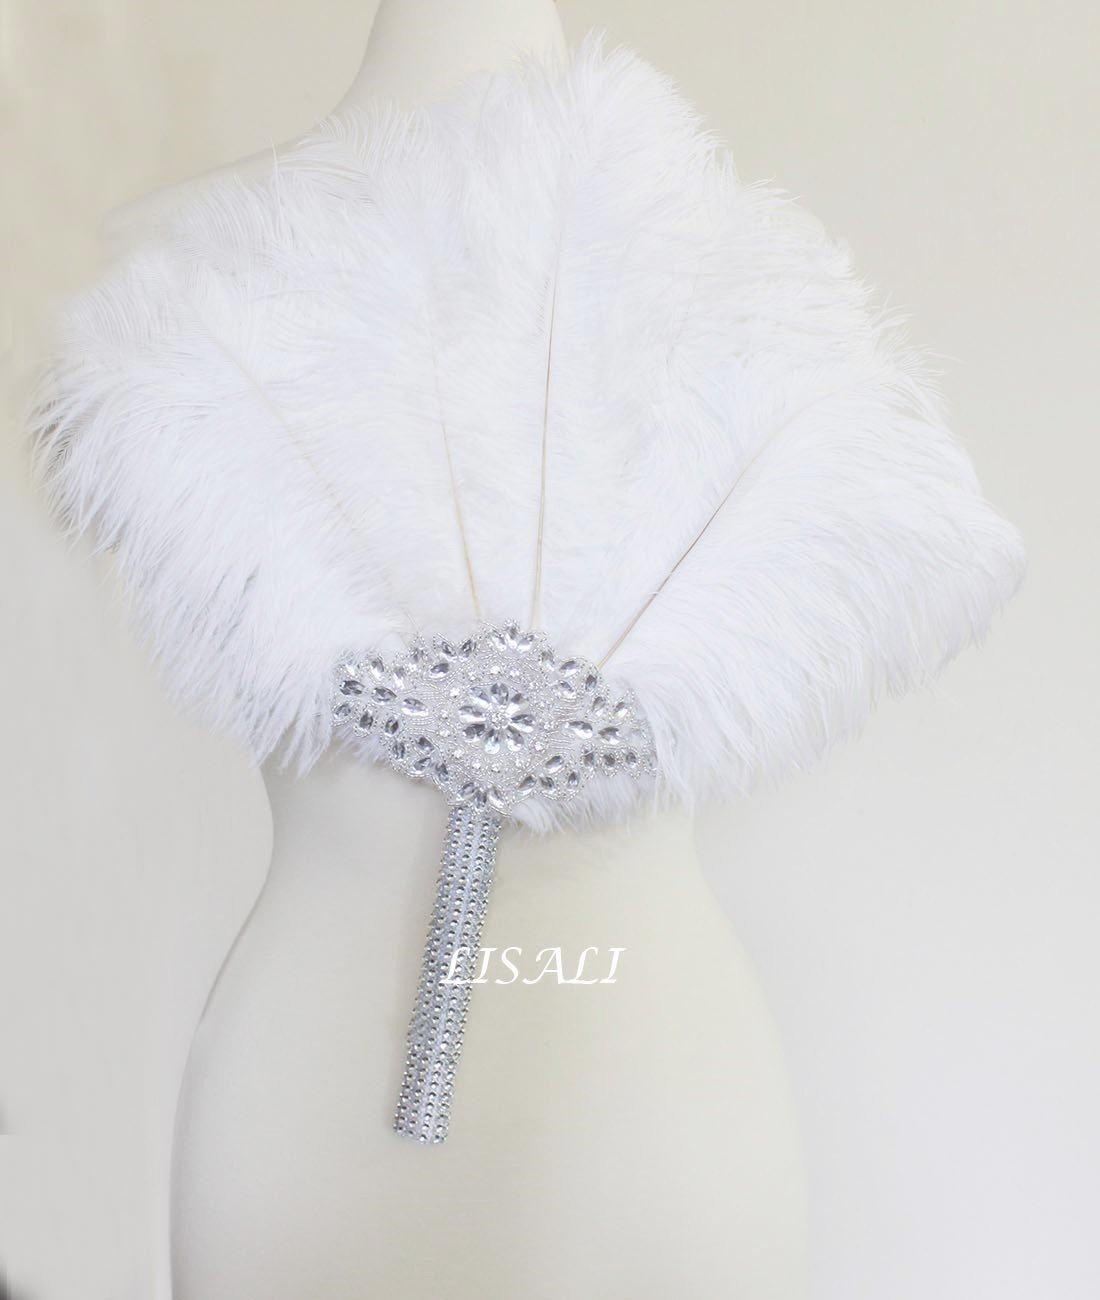 LISALI 18'' Large White Feather Bouquet, luxury Bridal Alternative Ostrich Feather Fan, 20s Great Gatsby Vintage Wedding Bouquet